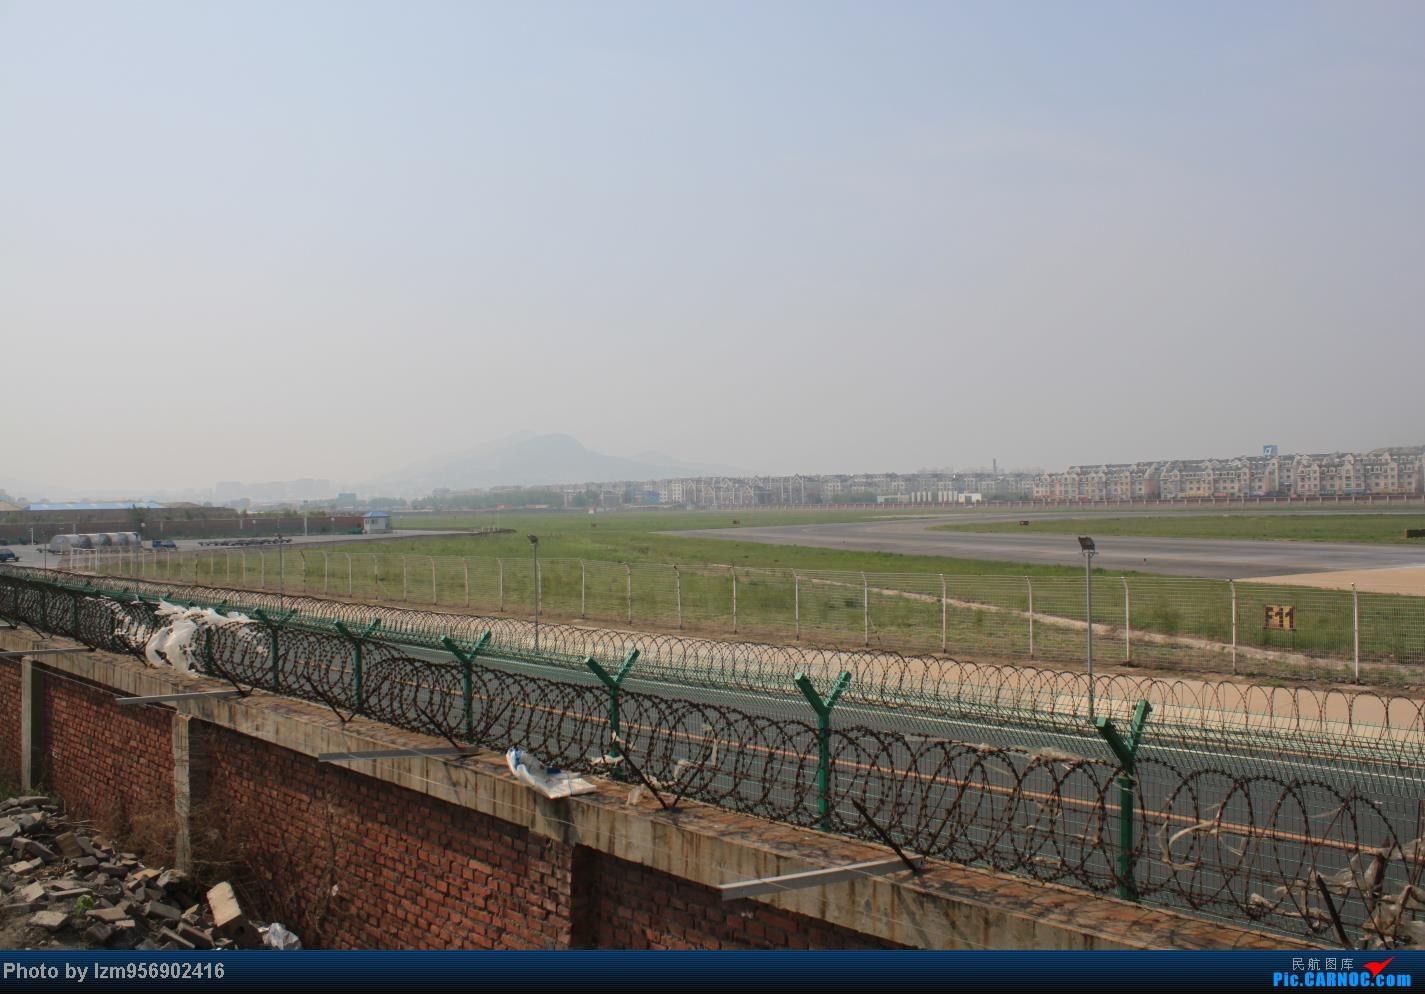 Re:[原创]DLC蹲点大半天,拍到了大棒航空772=w= BOEING 737-700 B-5806 中国大连周水子机场 中国大连周水子机场